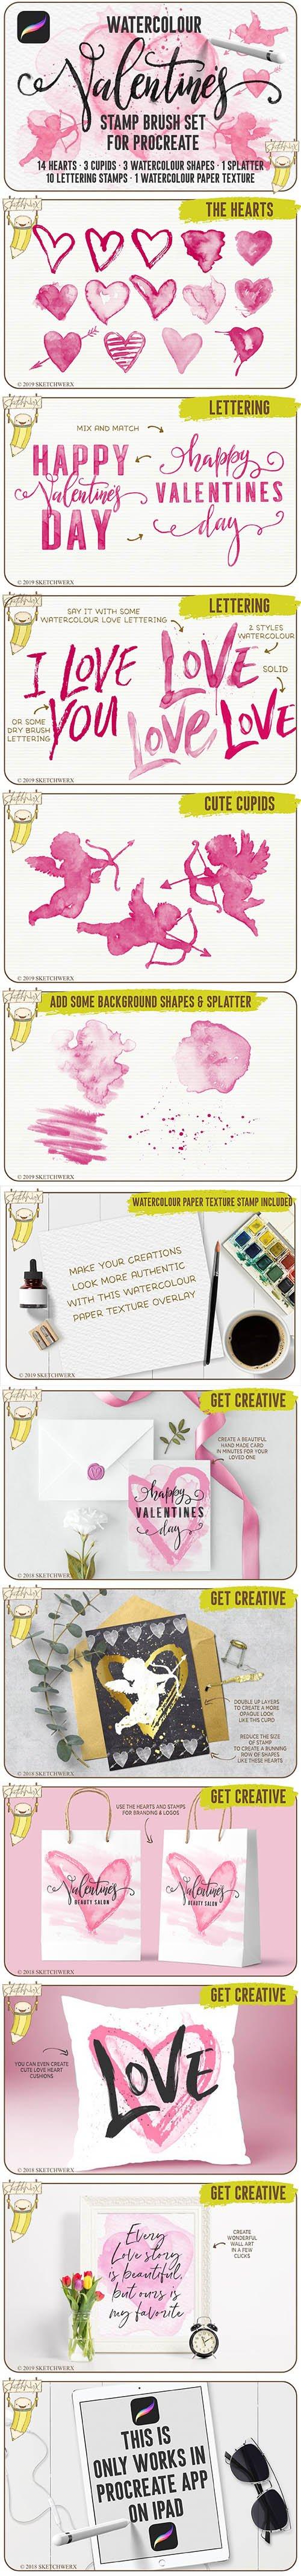 CreativeMarket - Watercolour Valentines Stamp Set 3378623